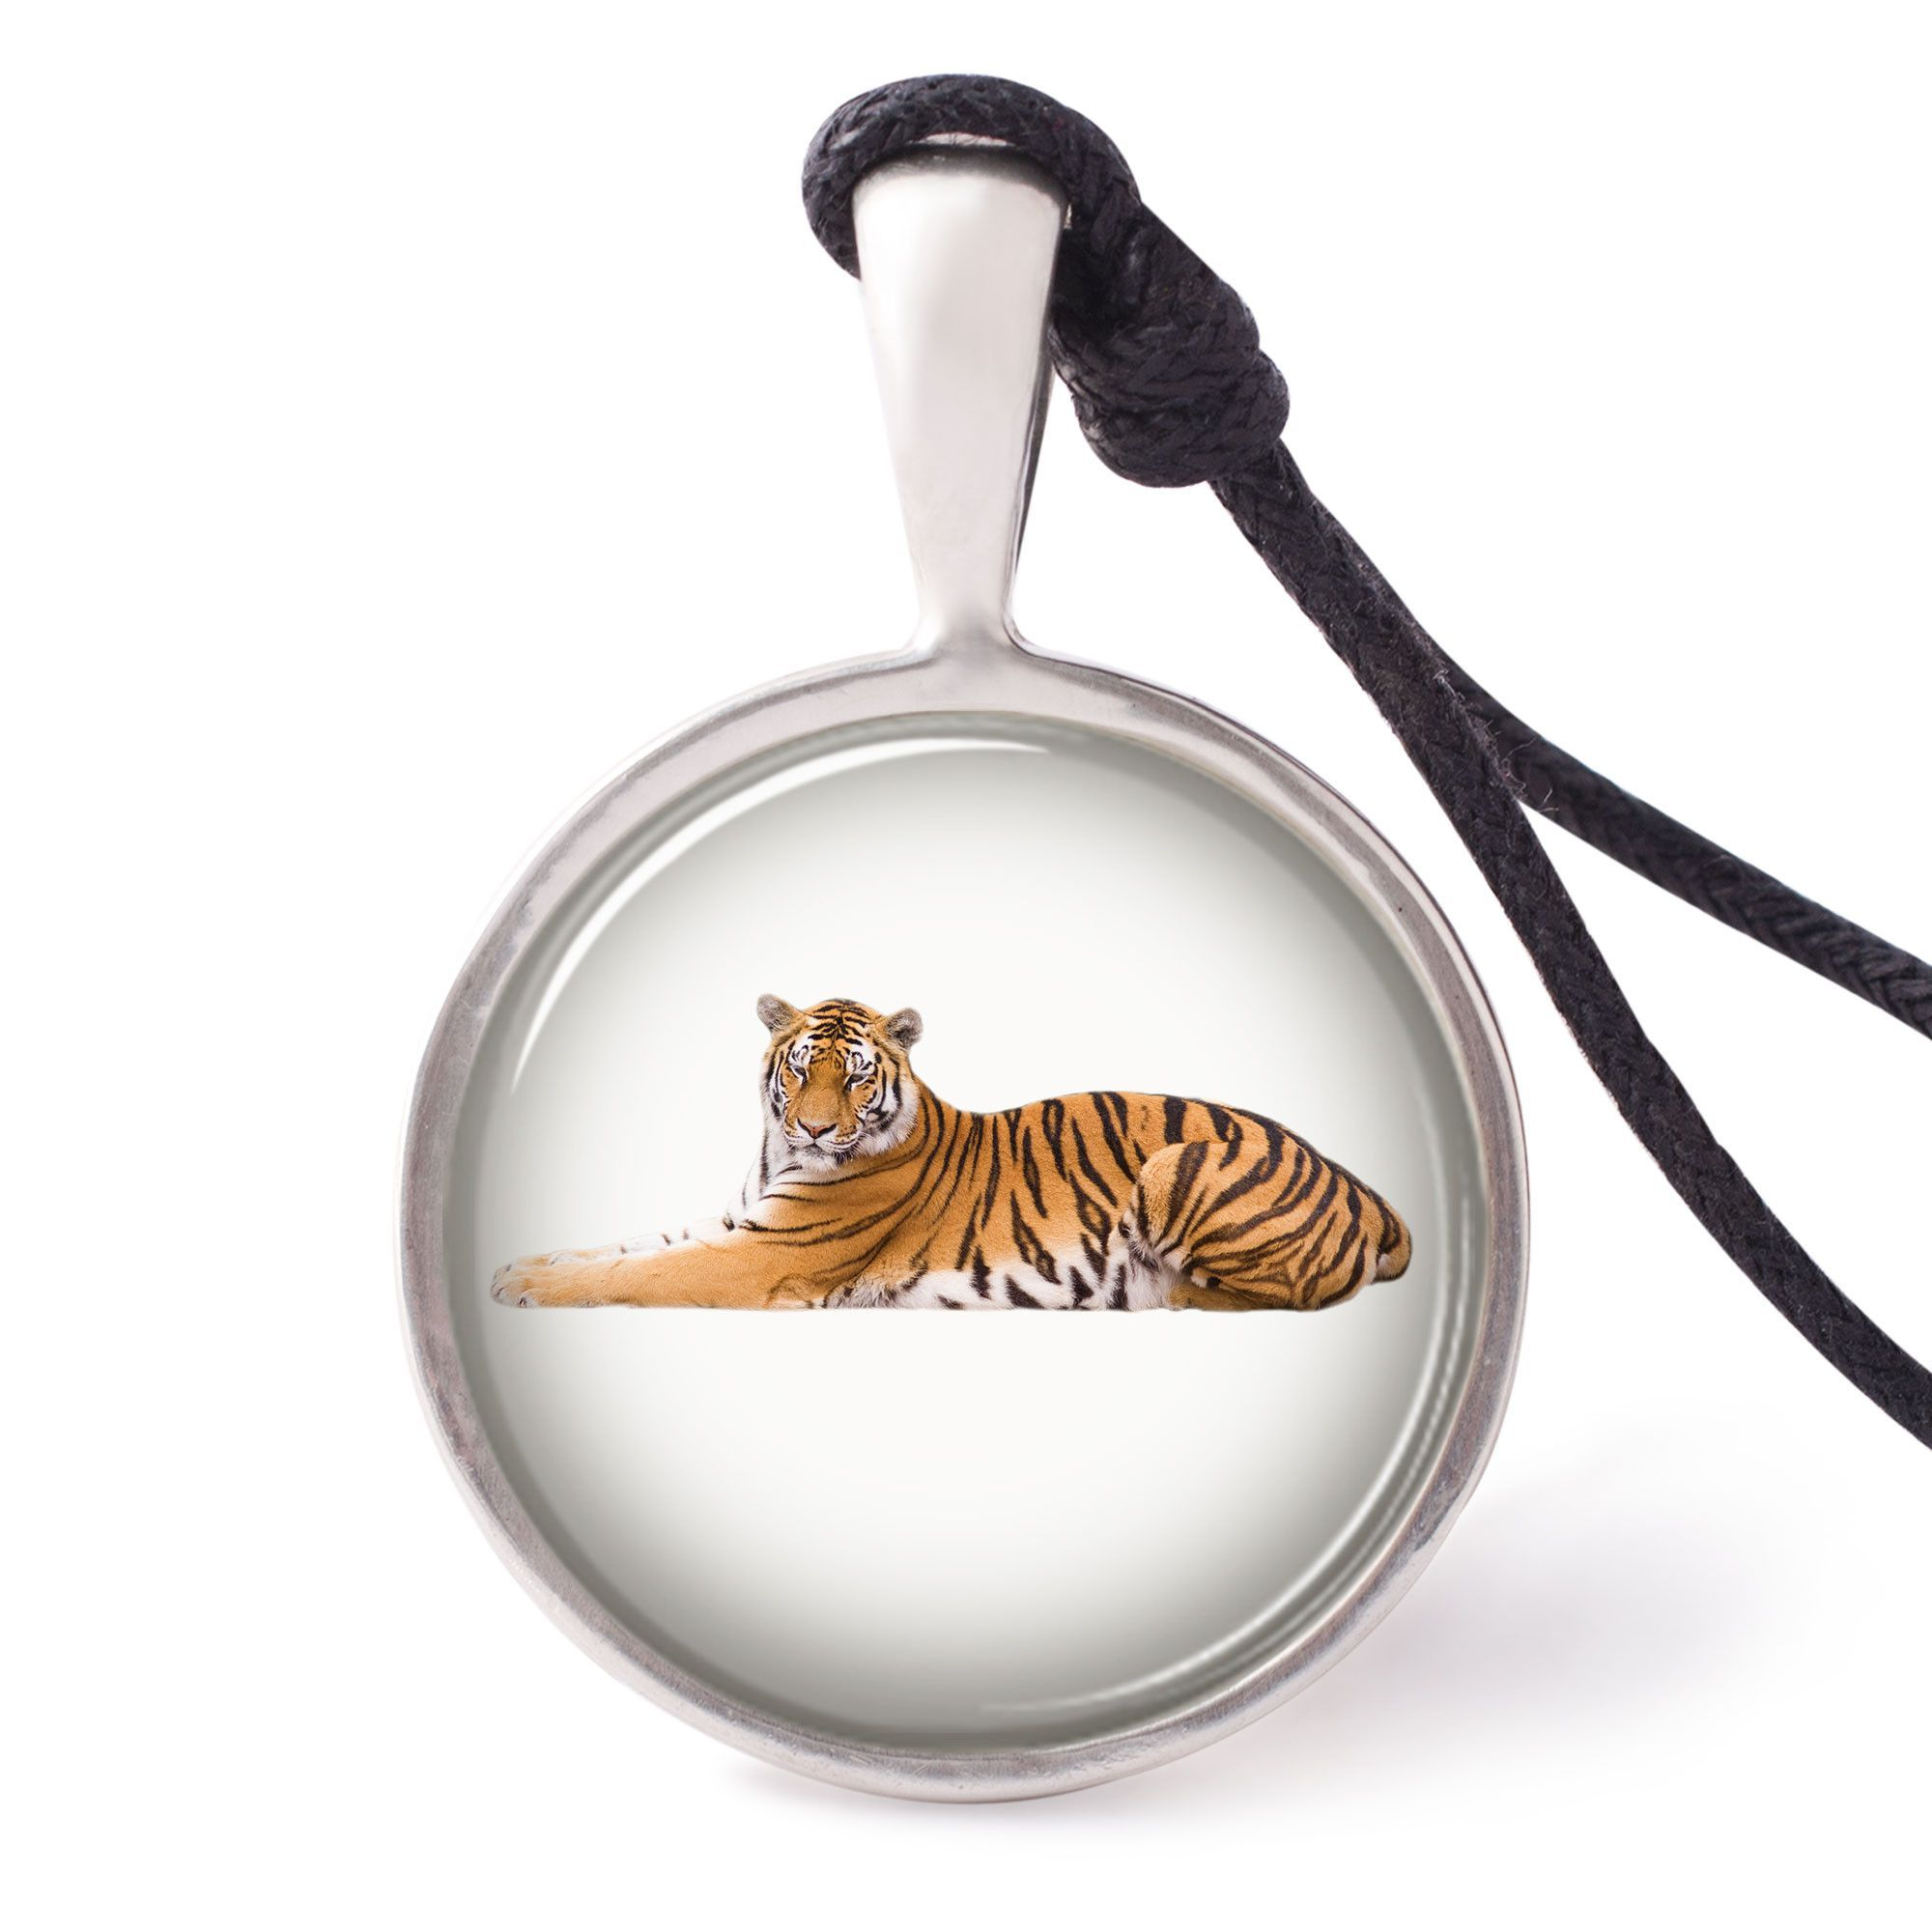 vietguild Cute Tiger Cub Necklace Pendants Pewter Silver